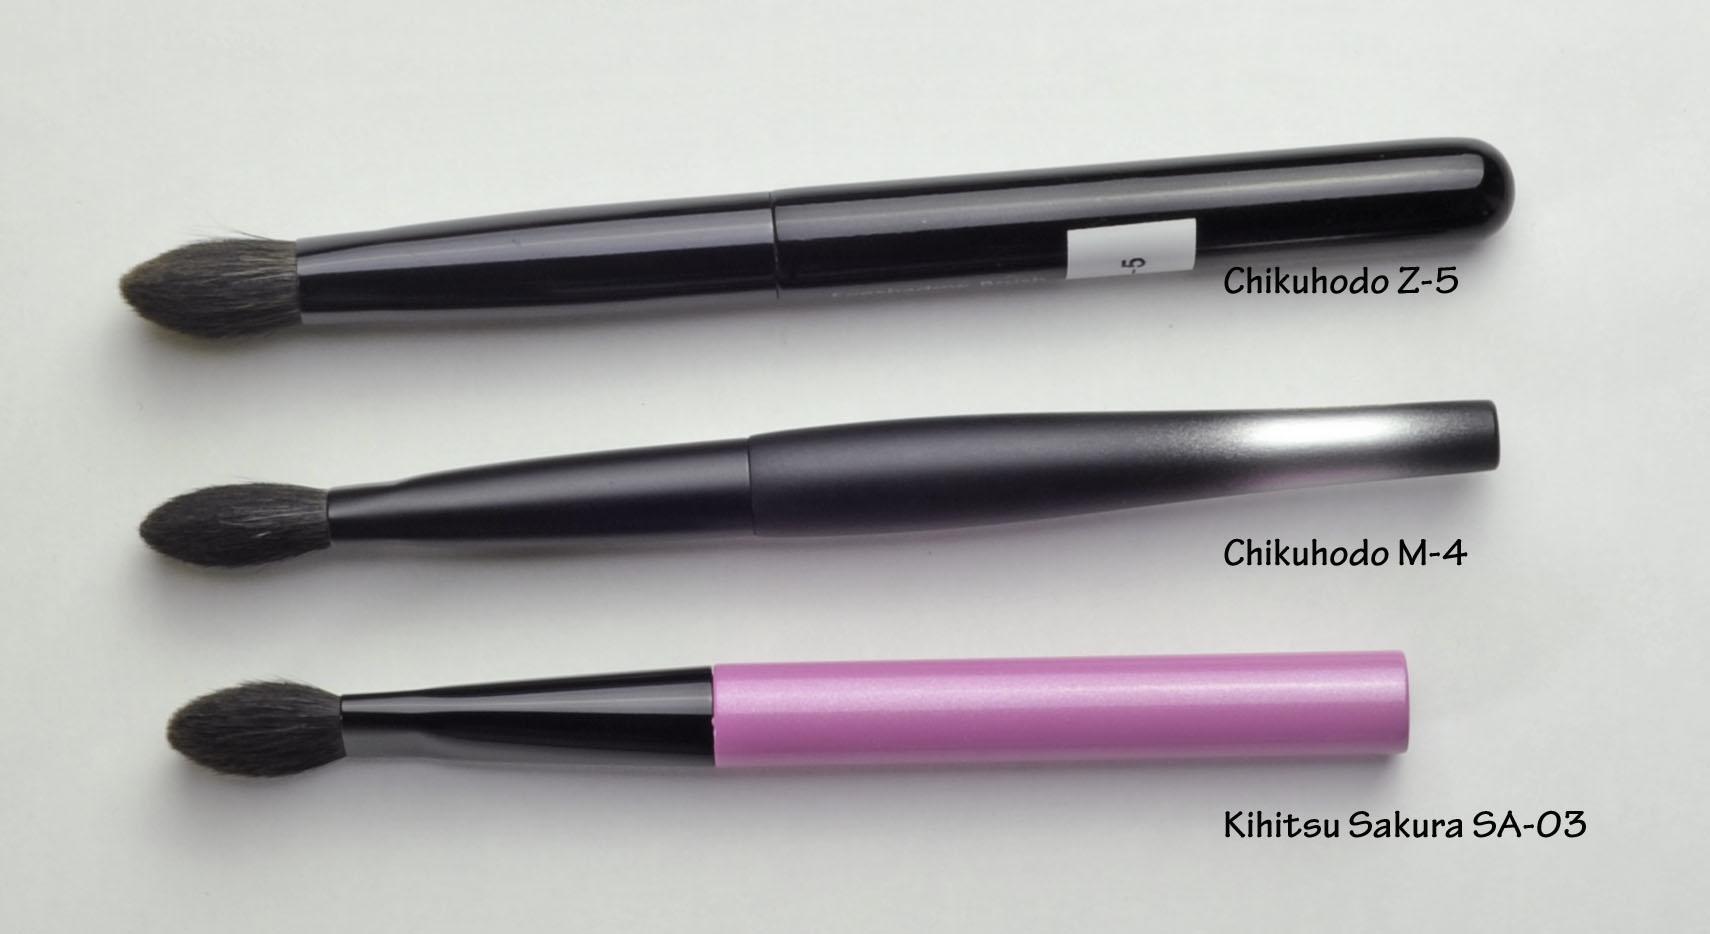 chikuhodosakurasideways